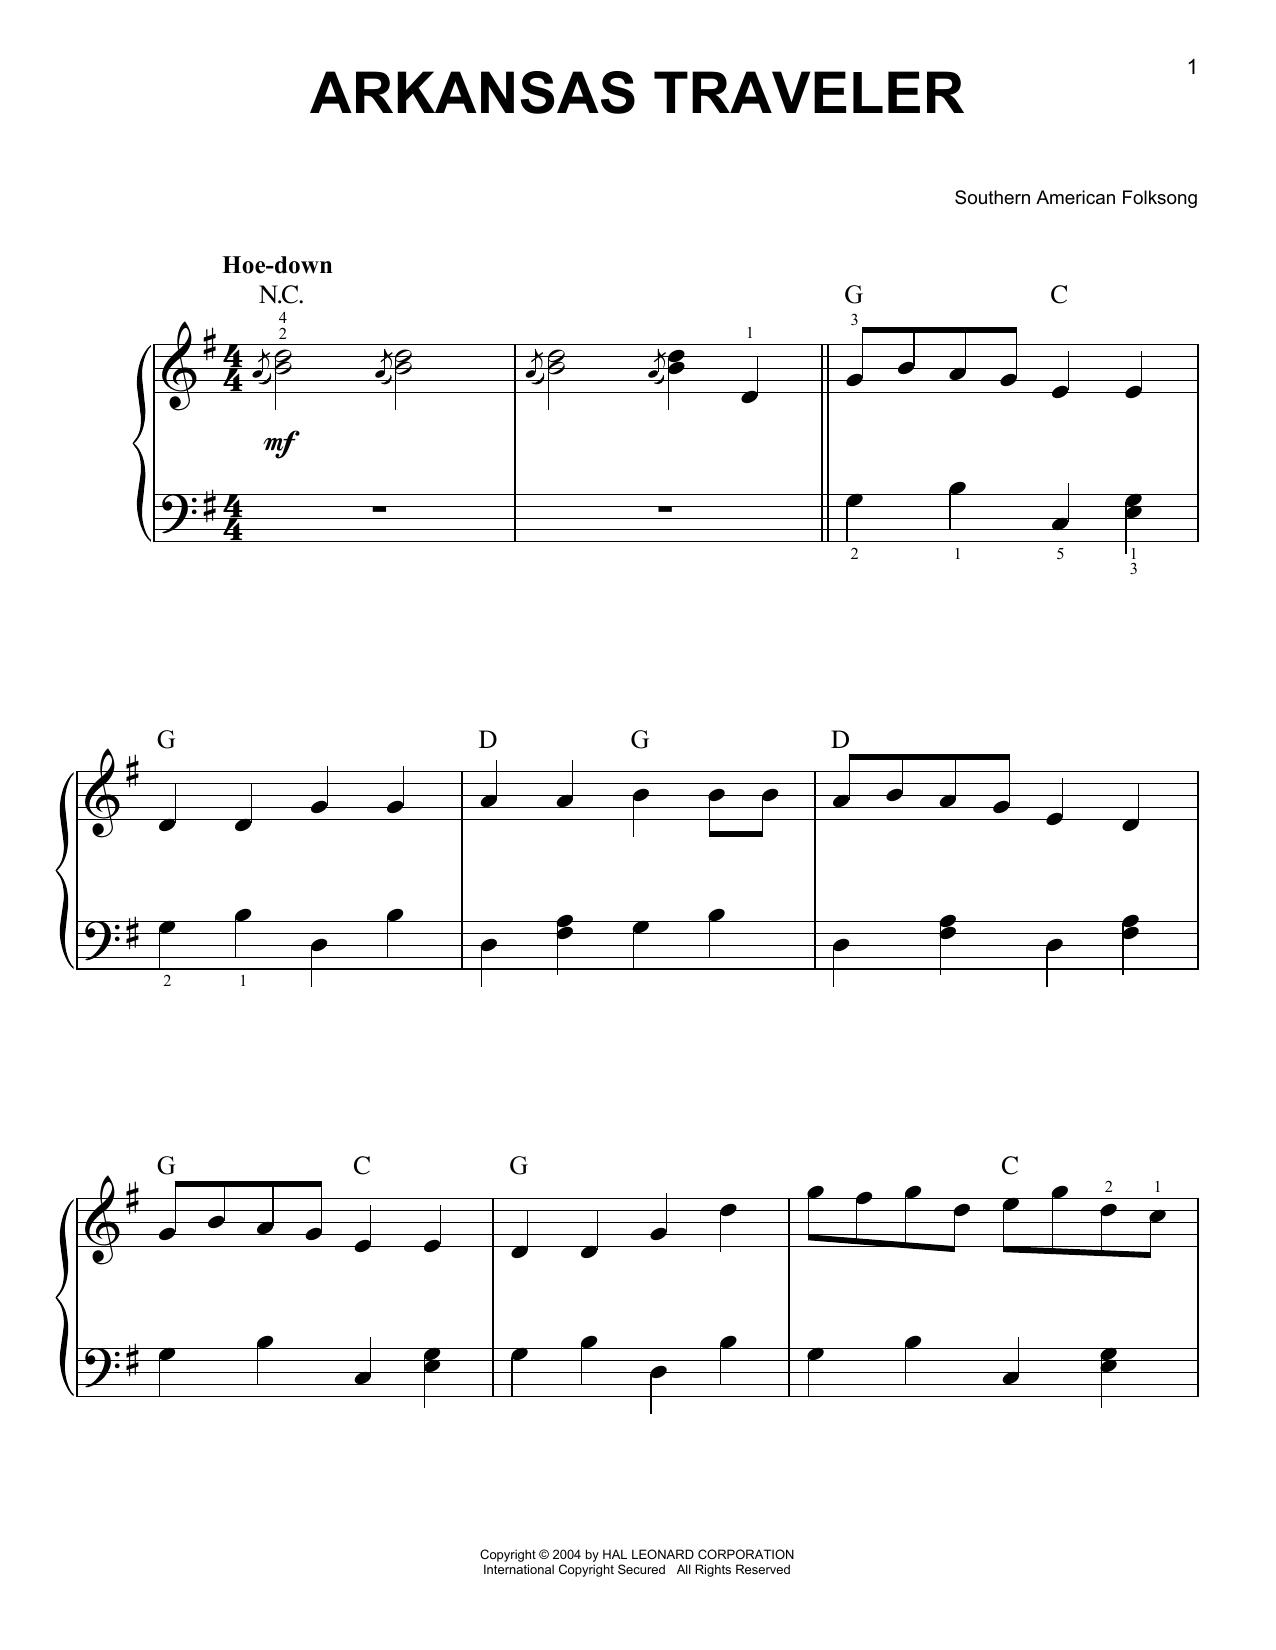 Southern American Folksong Arkansas Traveler sheet music notes and chords